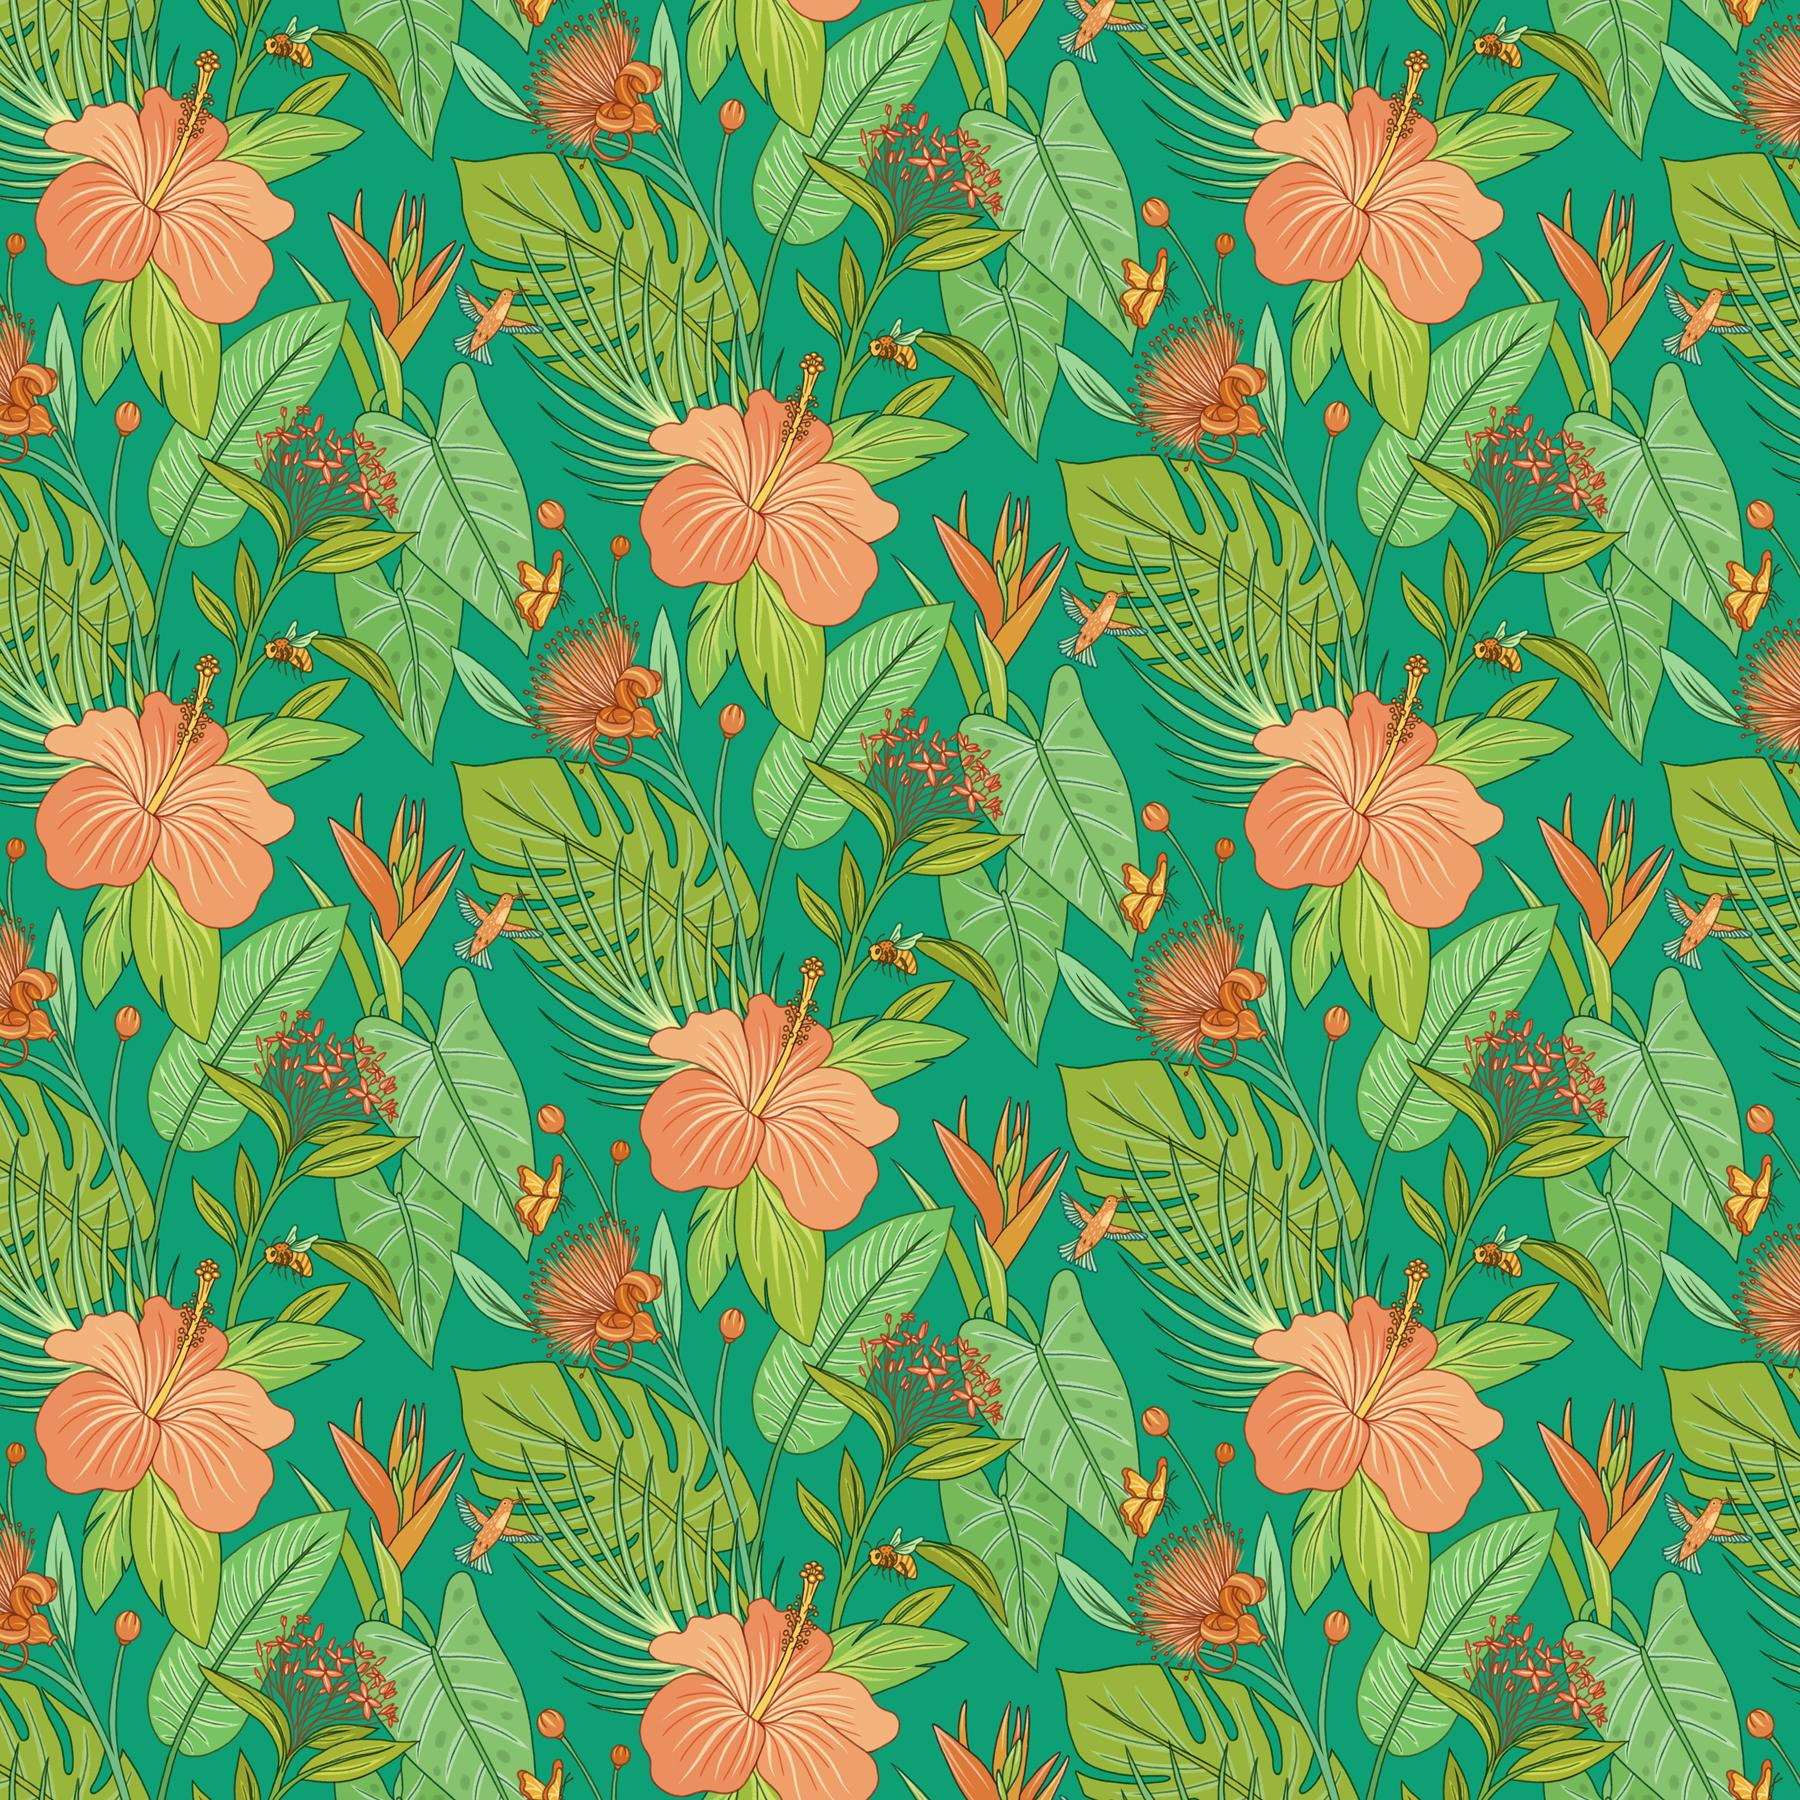 flor-test-layered.jpg